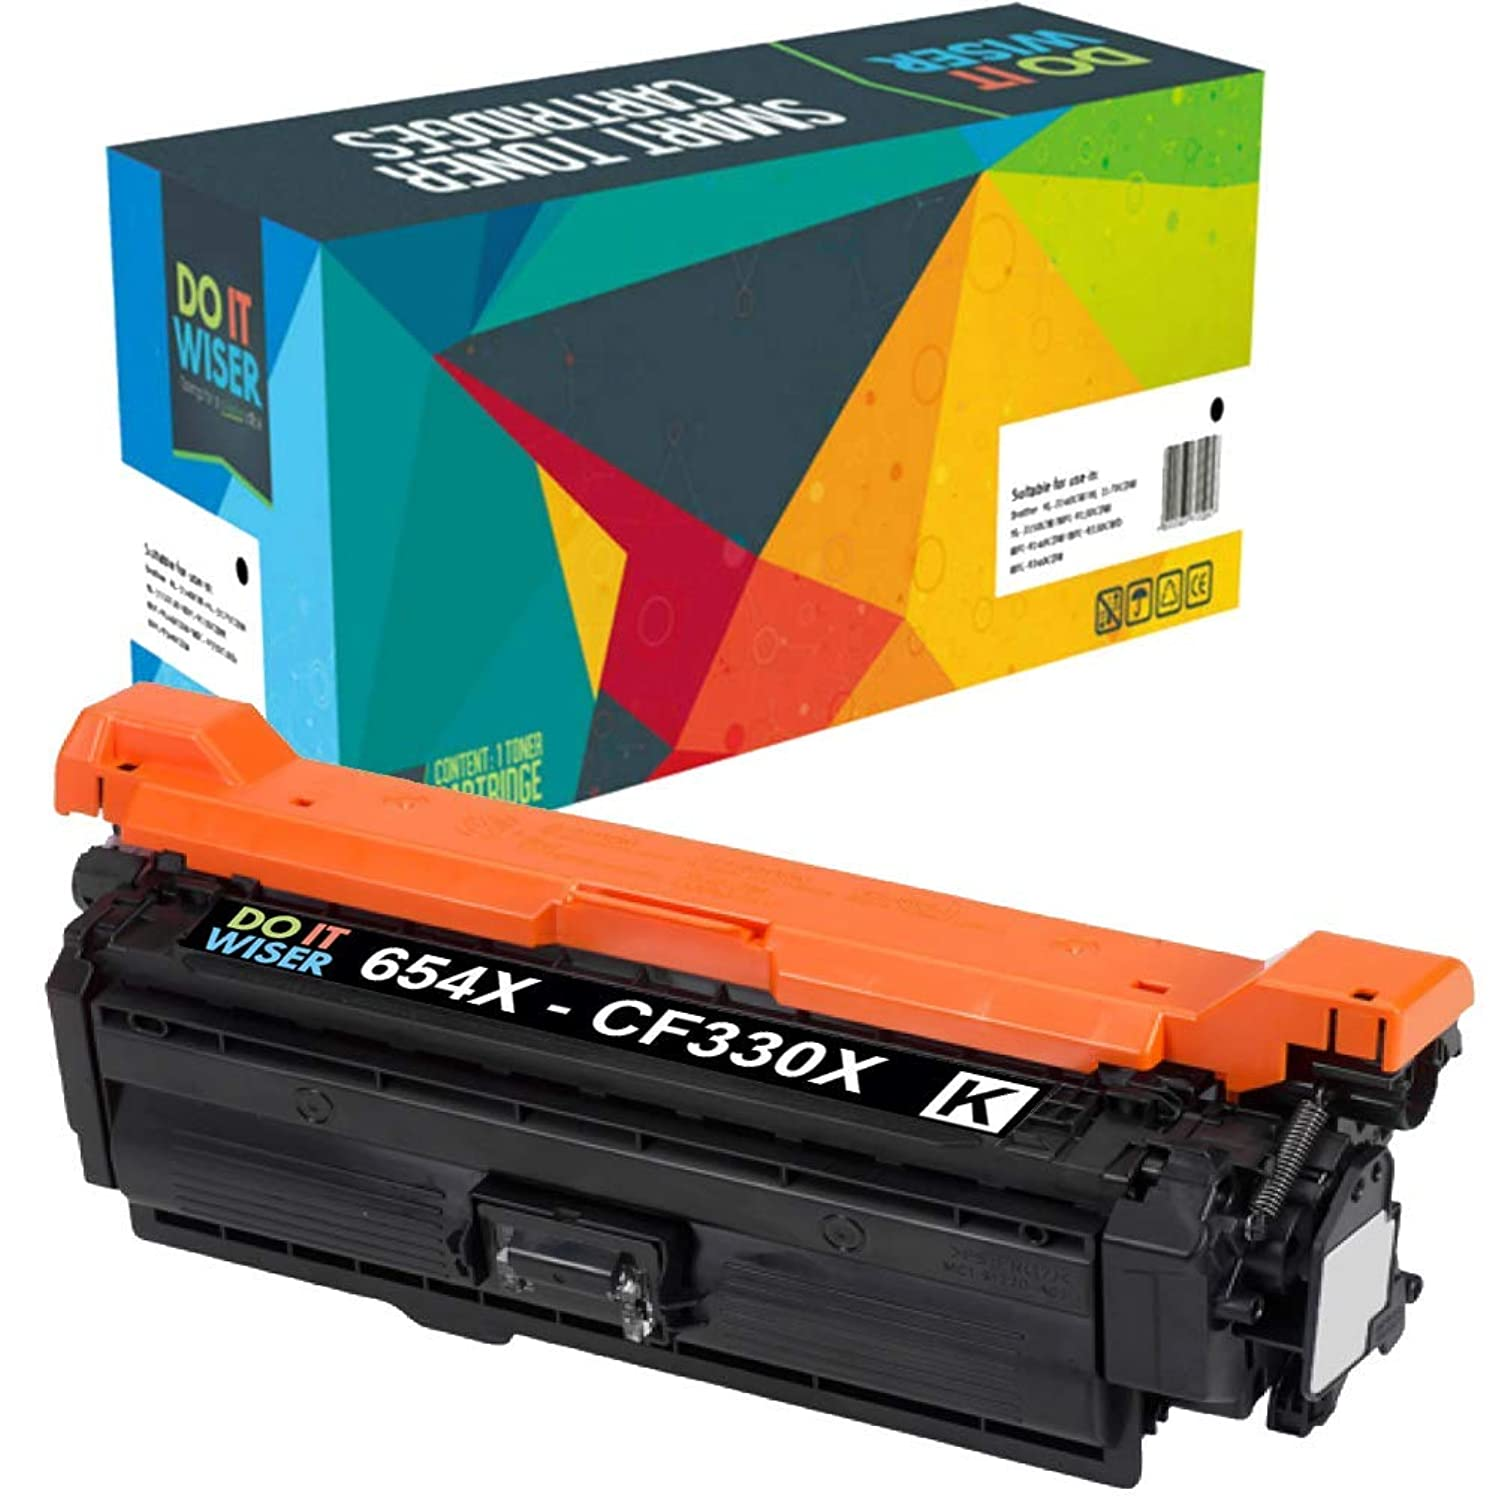 Do it Wiser Compatible Toner Cartridge Replacement for HP 654X CF330X for use in HP LaserJet M651 M651N M651DN M651XH (Black)